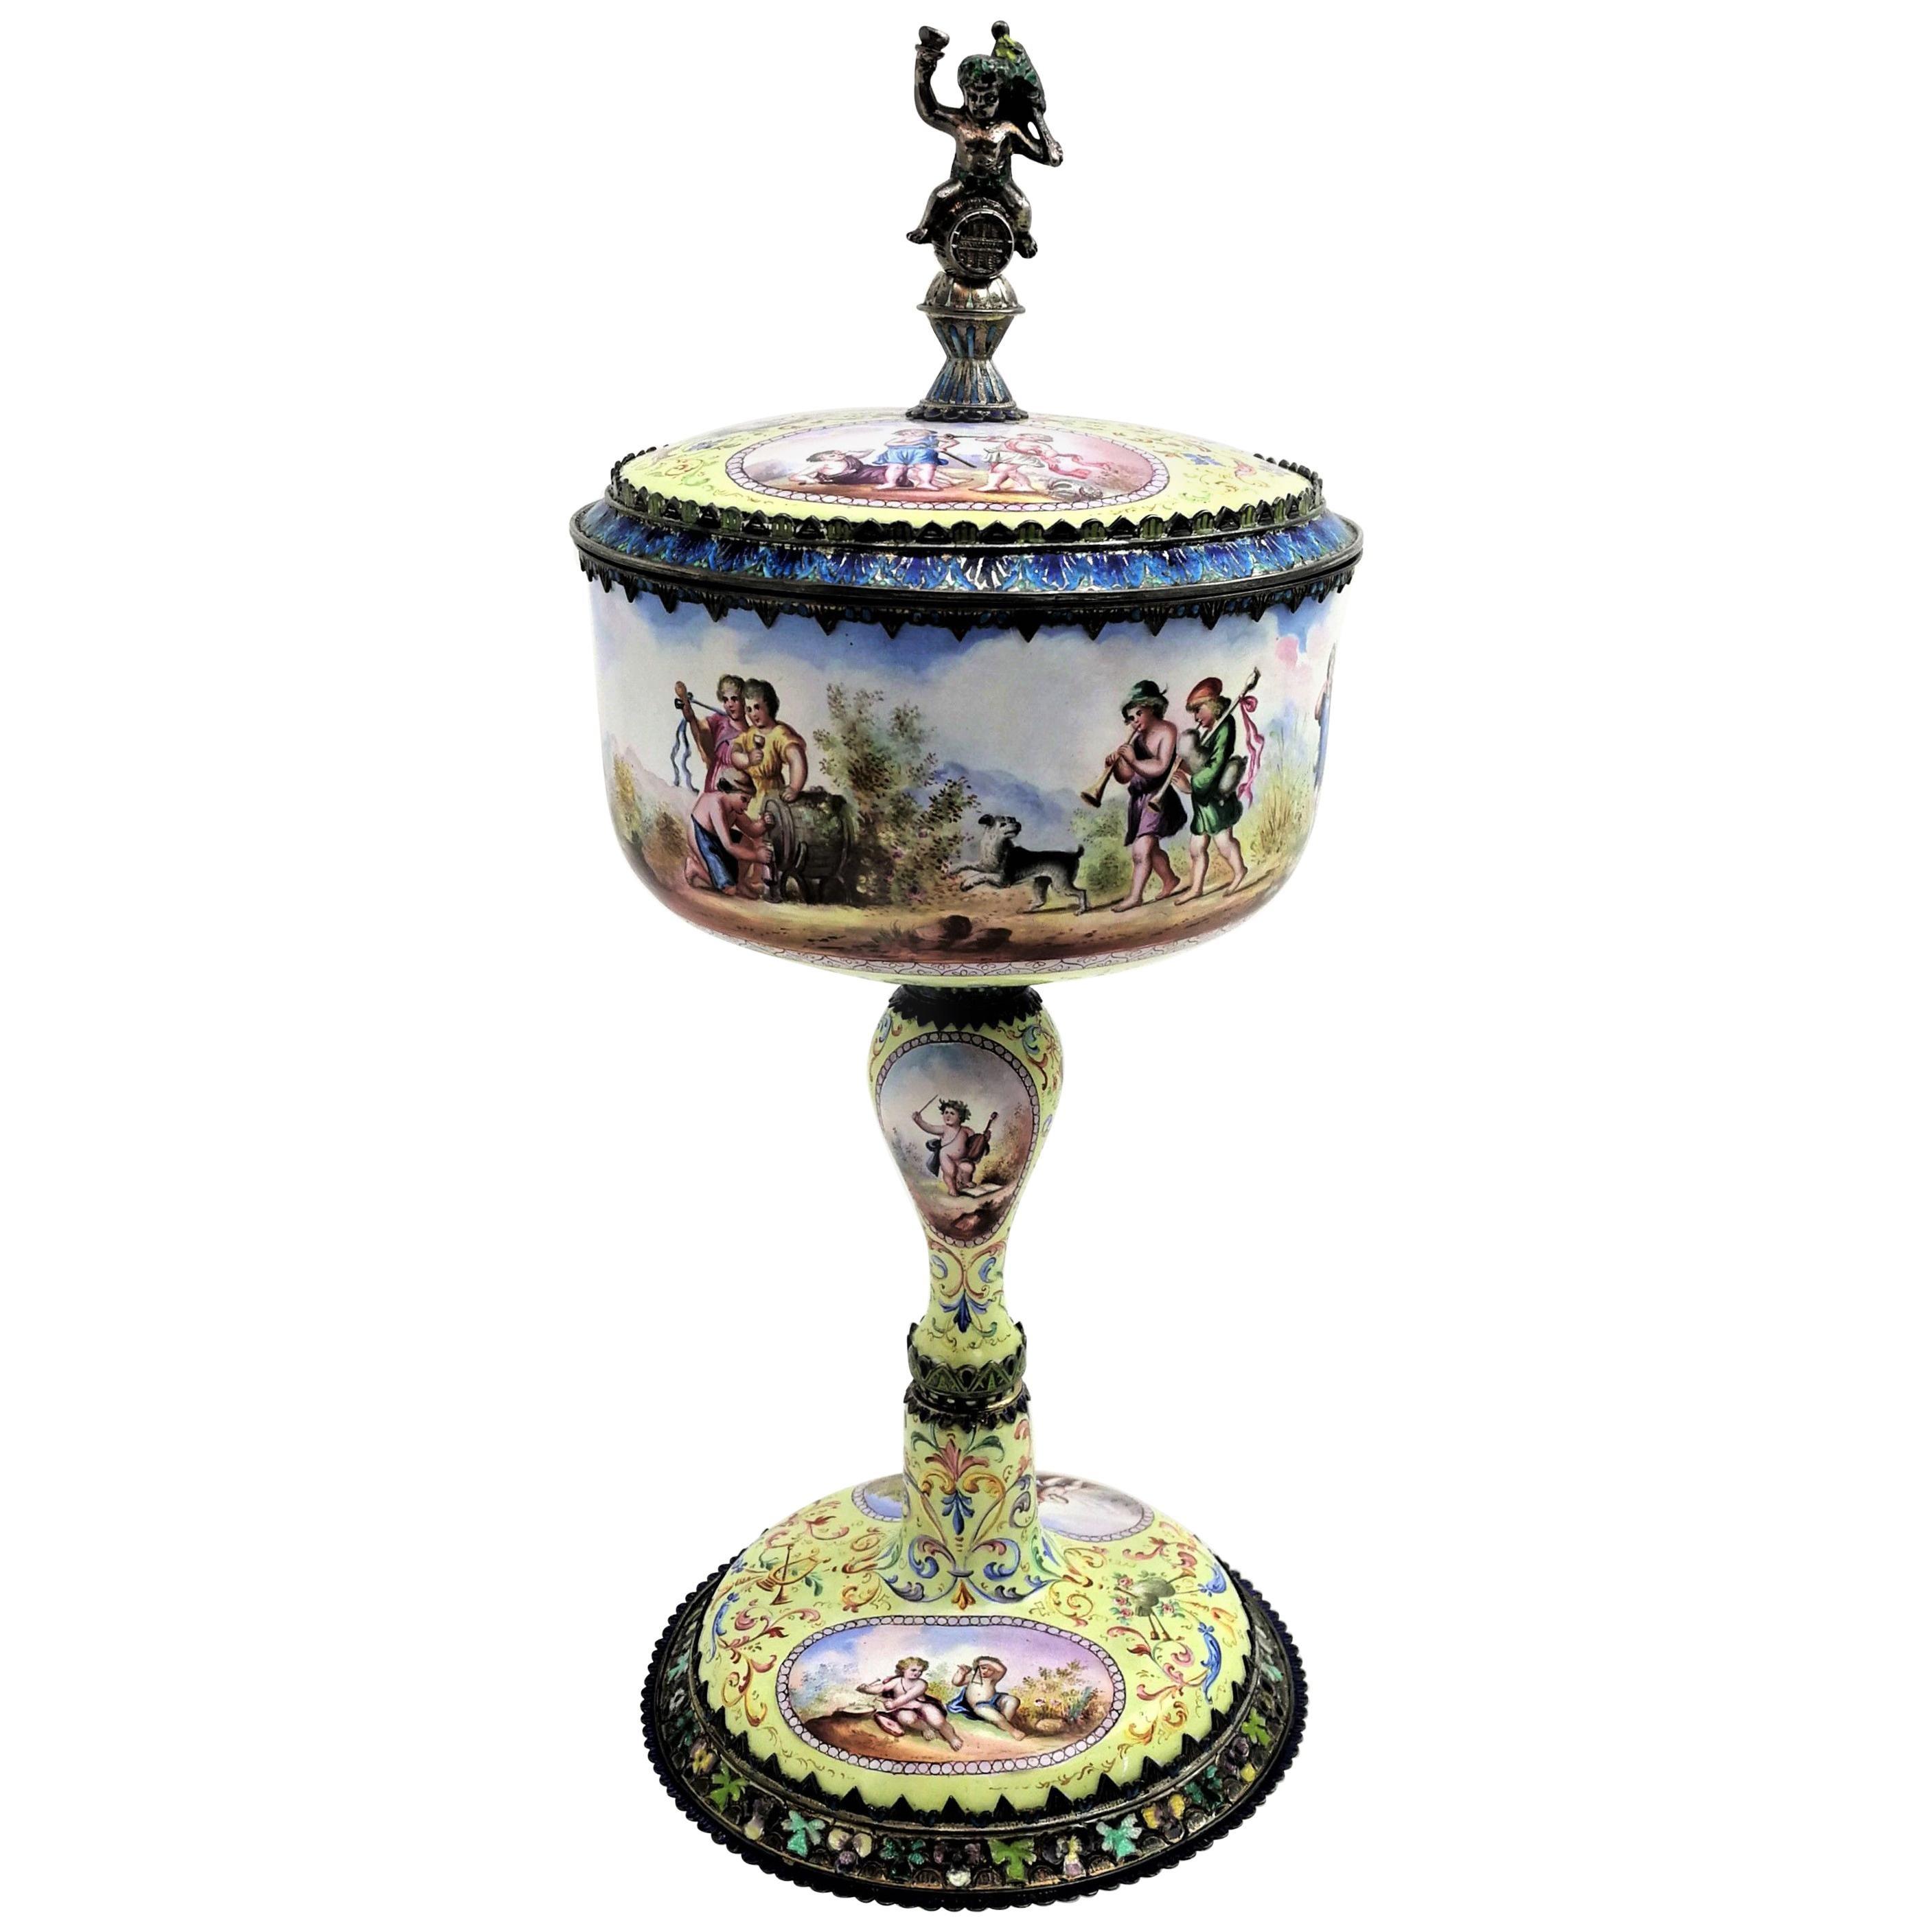 Antique Viennese Enamel & Silver Cup & Cover c 1870 (Vienna, Austria)